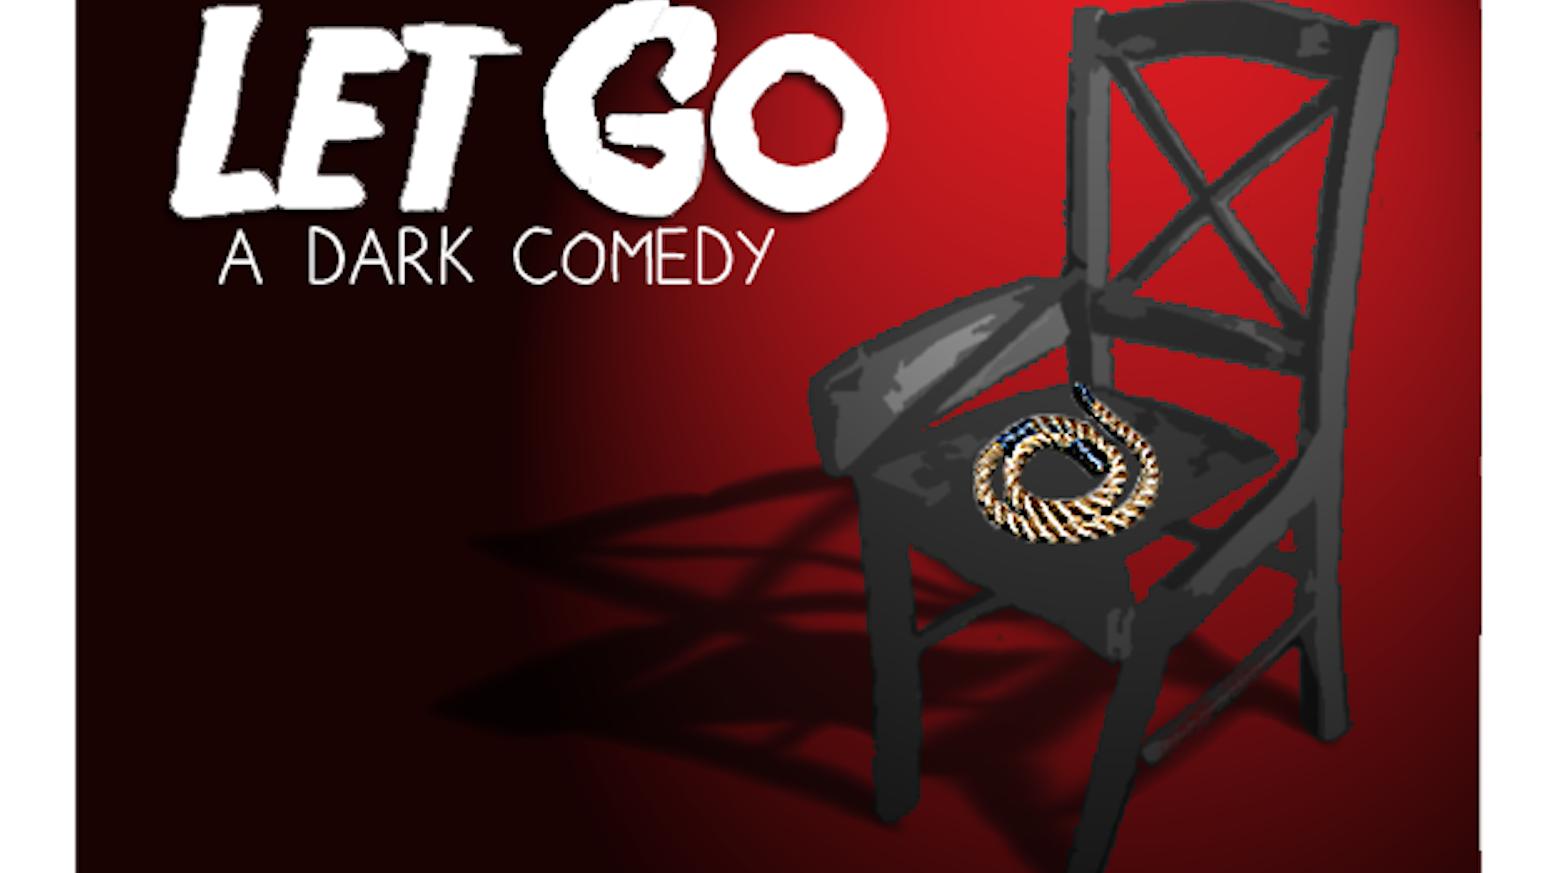 Let Go by Jamie Rogers — Kickstarter